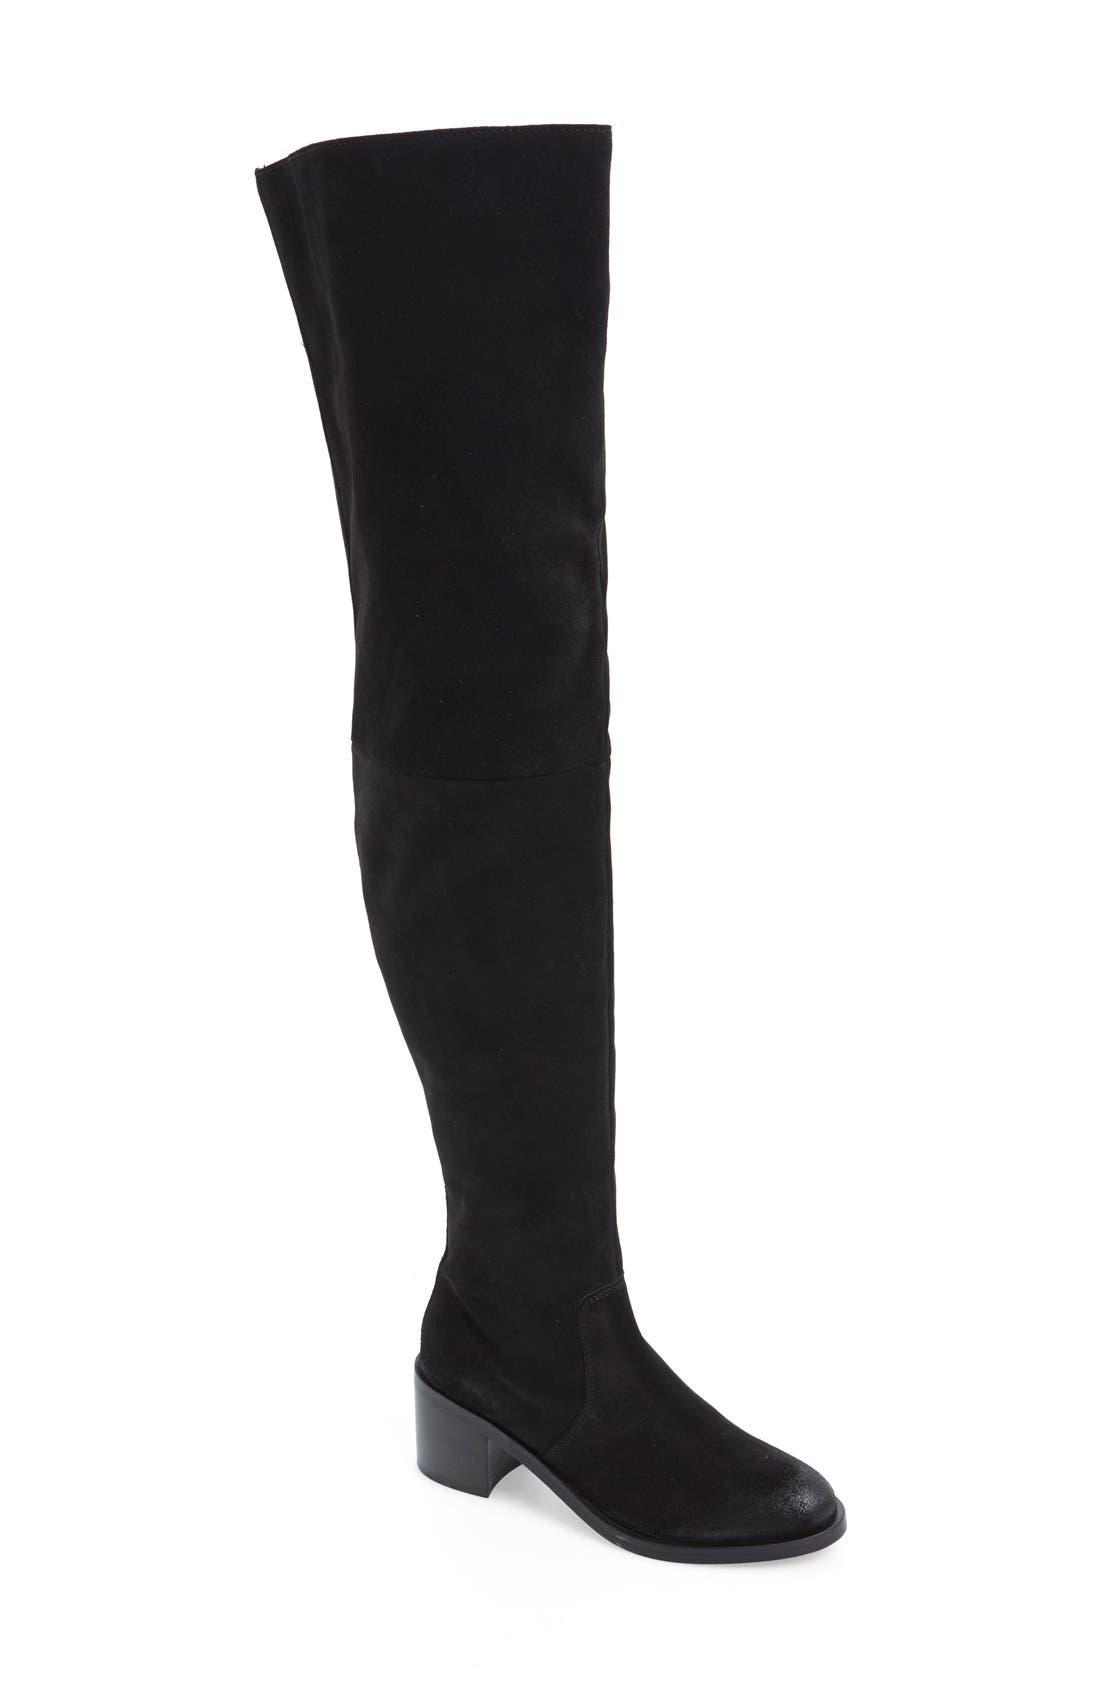 'Sardonyx' Thigh High Boot,                             Main thumbnail 1, color,                             001